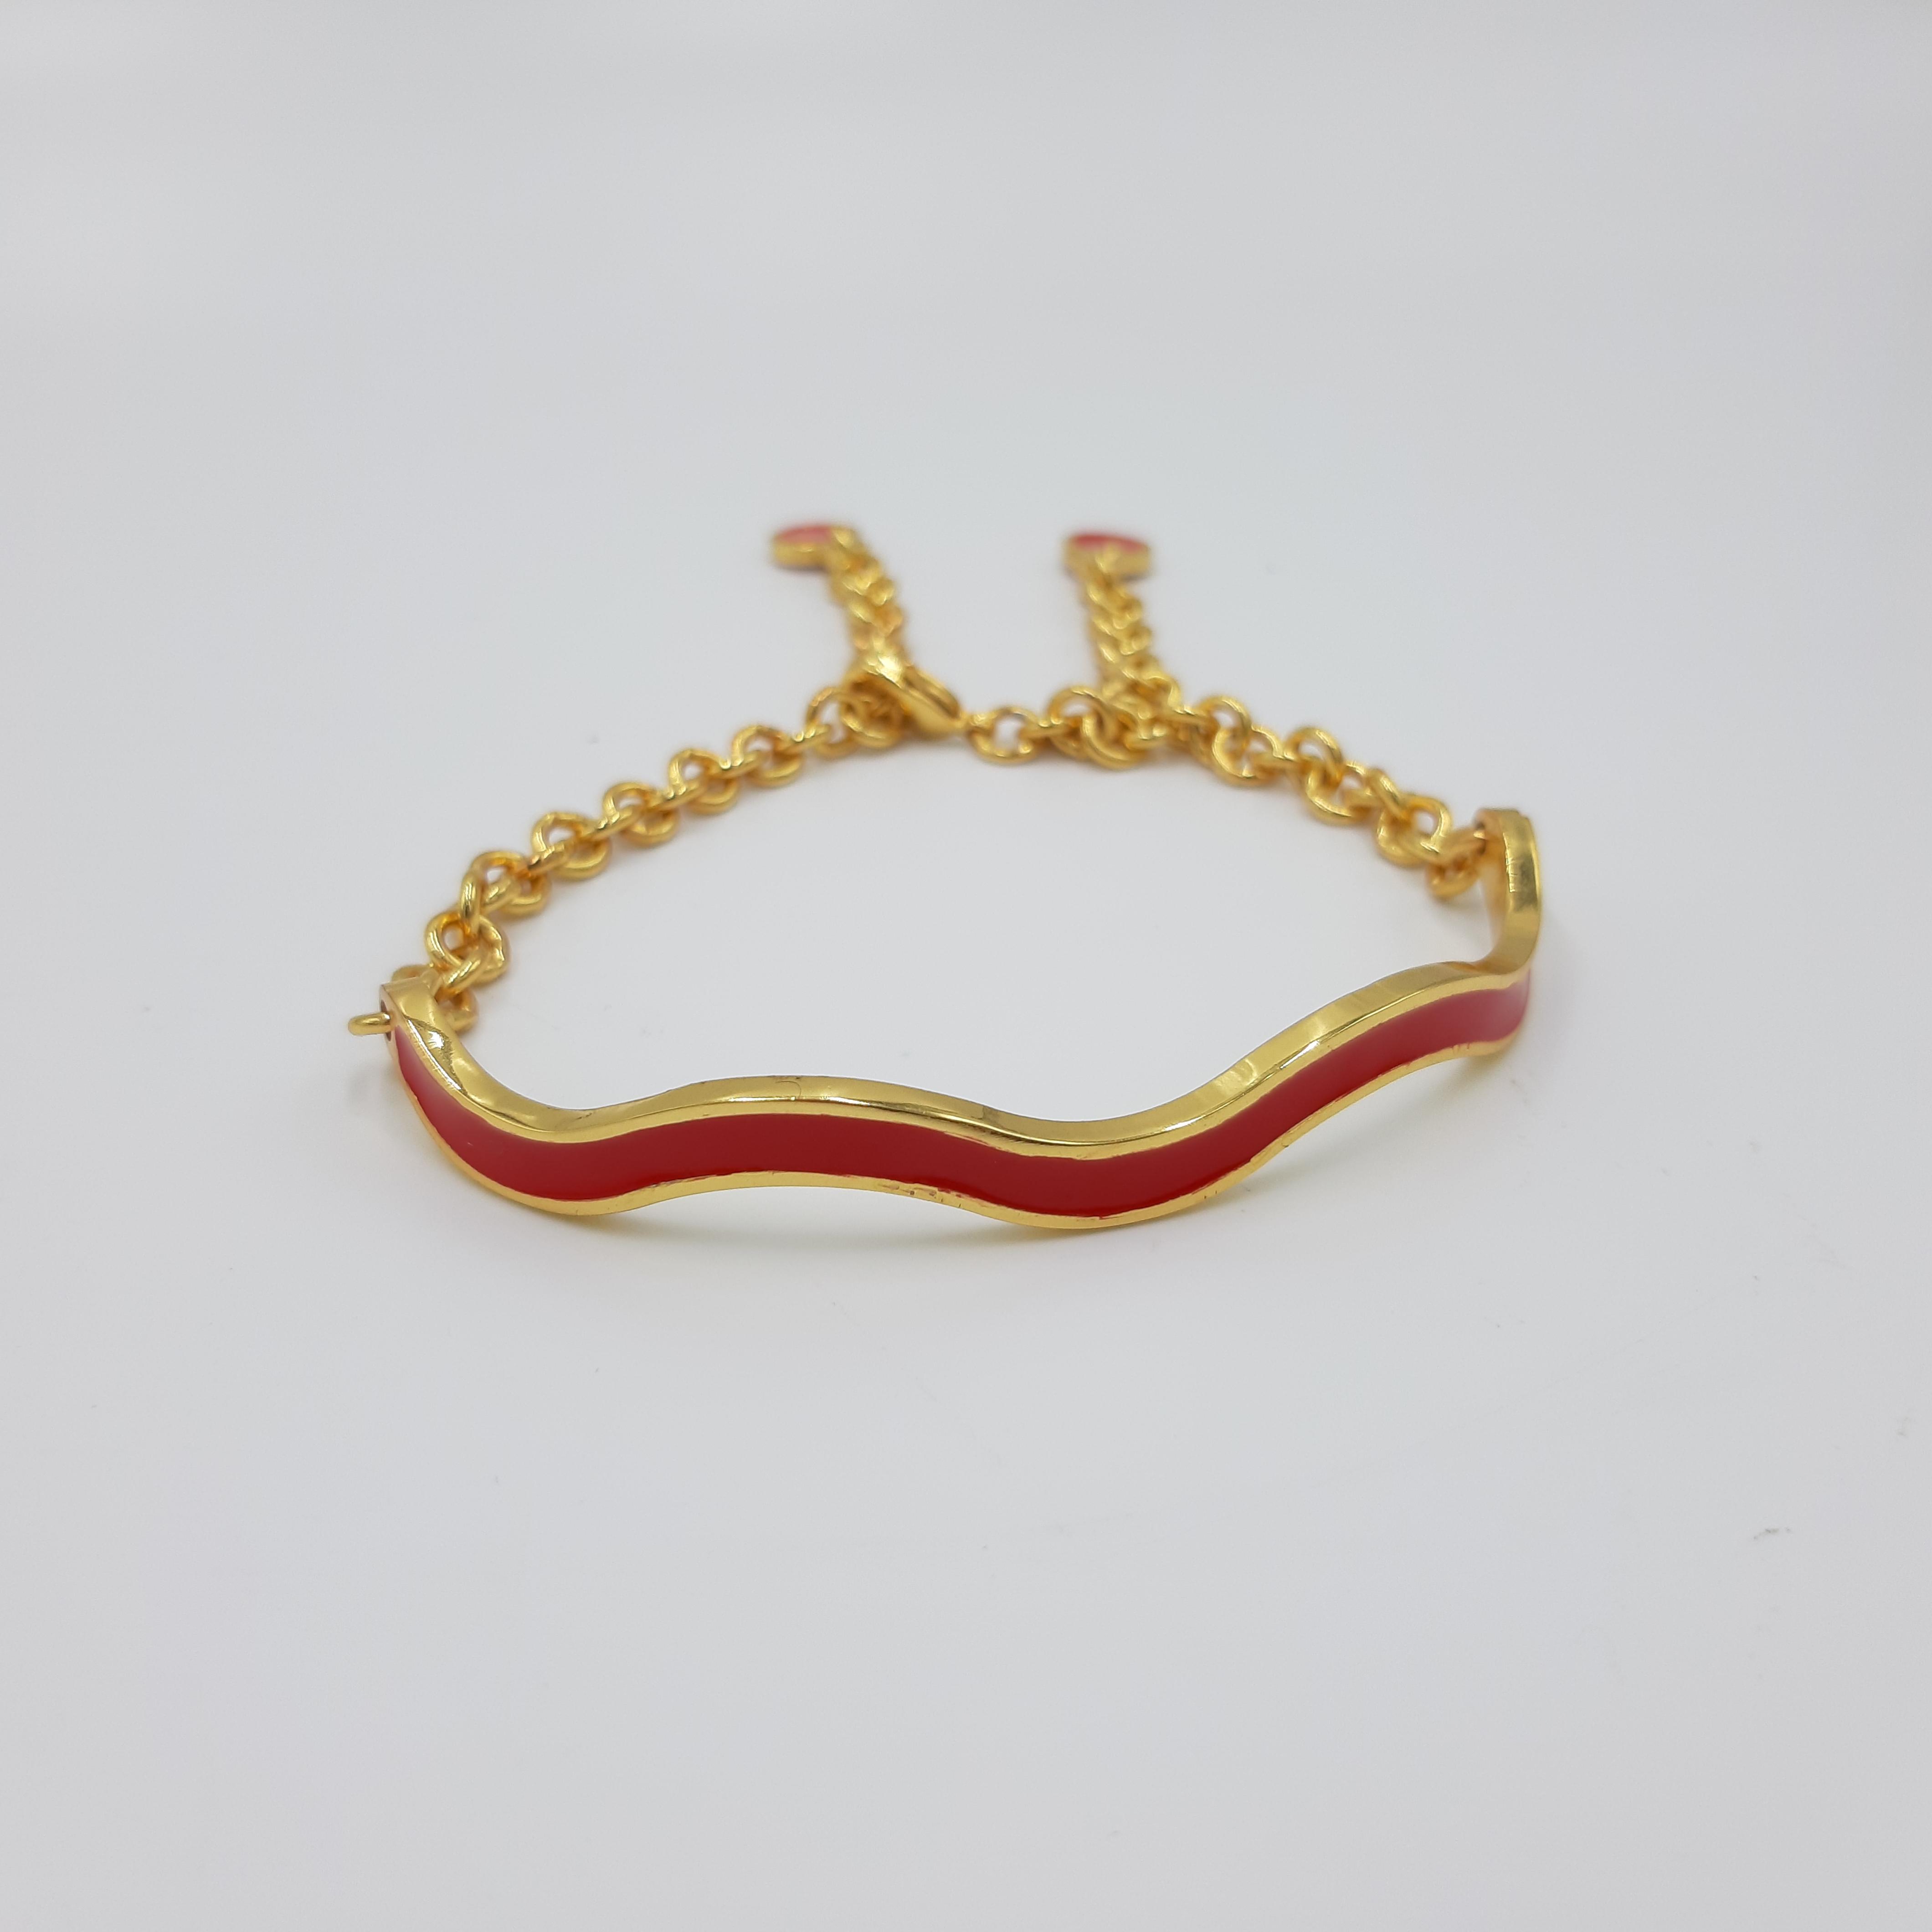 Bracciale rosso regolabile onda Francesca Bianchi Design